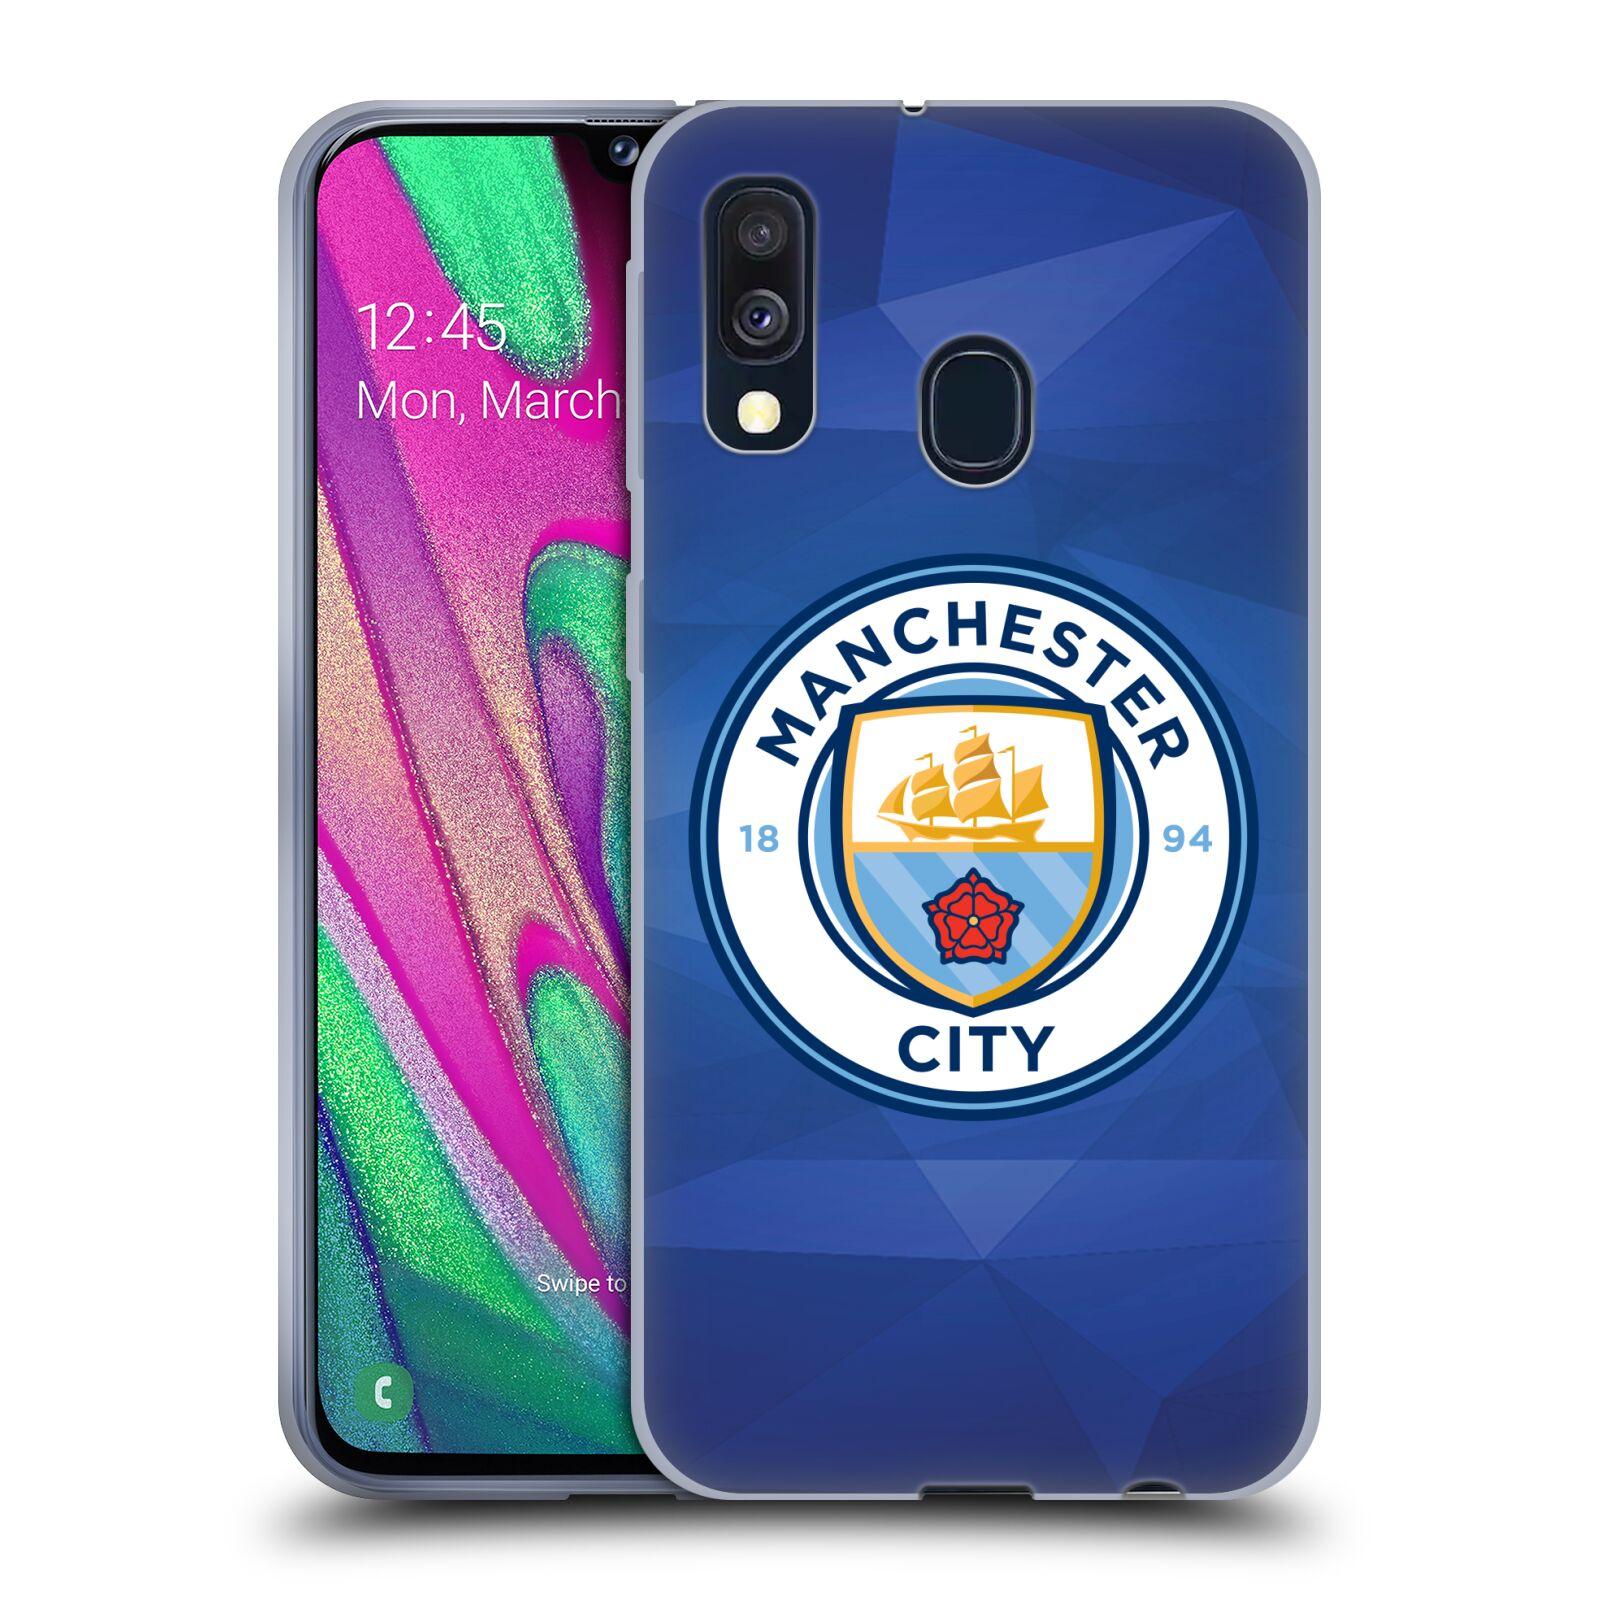 Silikonové pouzdro na mobil Samsung Galaxy A40 - Head Case - Manchester City FC - Modré nové logo